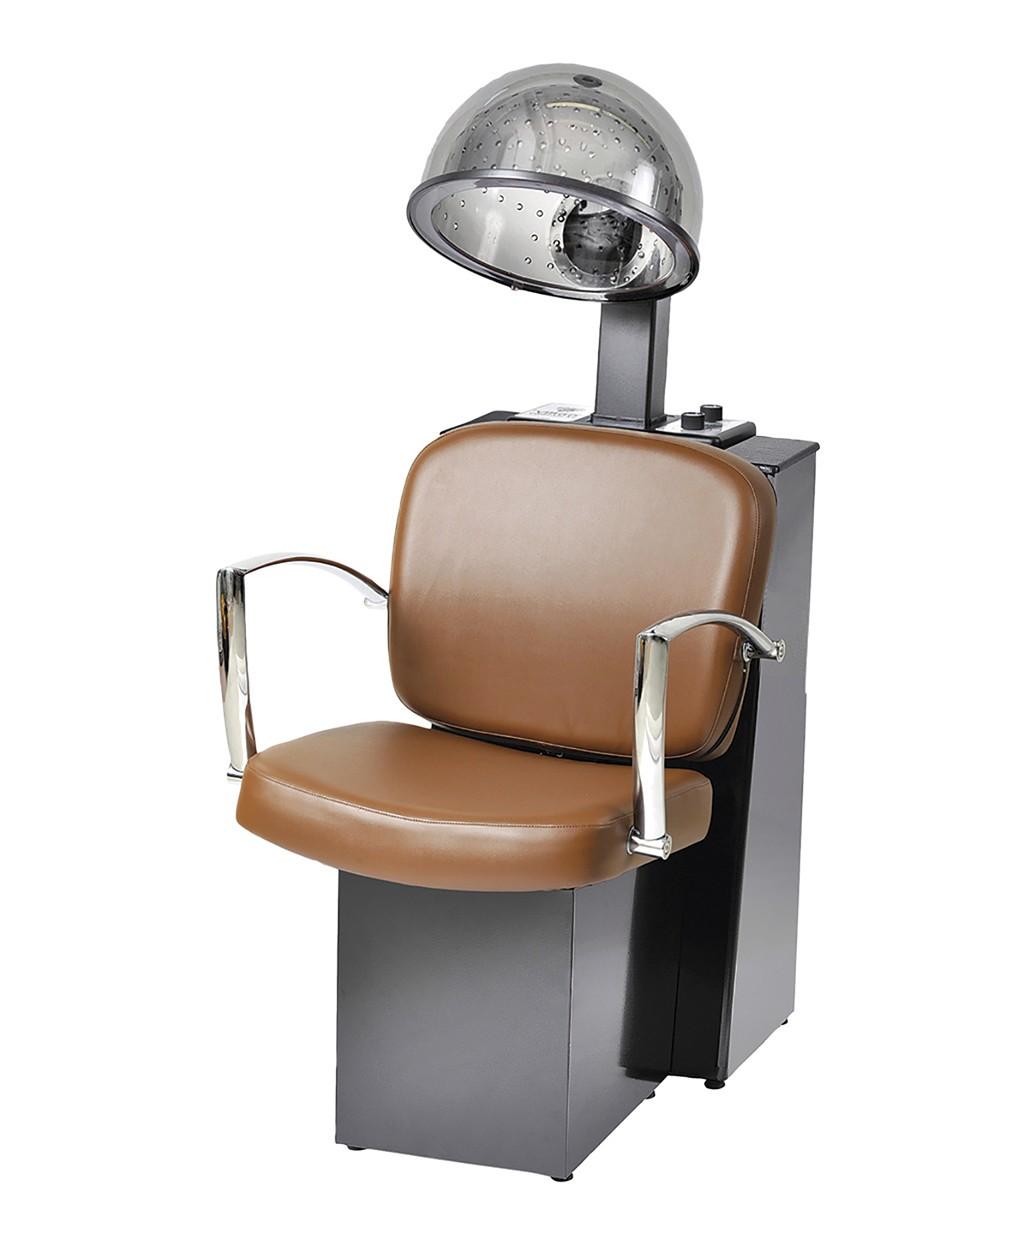 Pibbs 3769 Pisa Dryer Chair